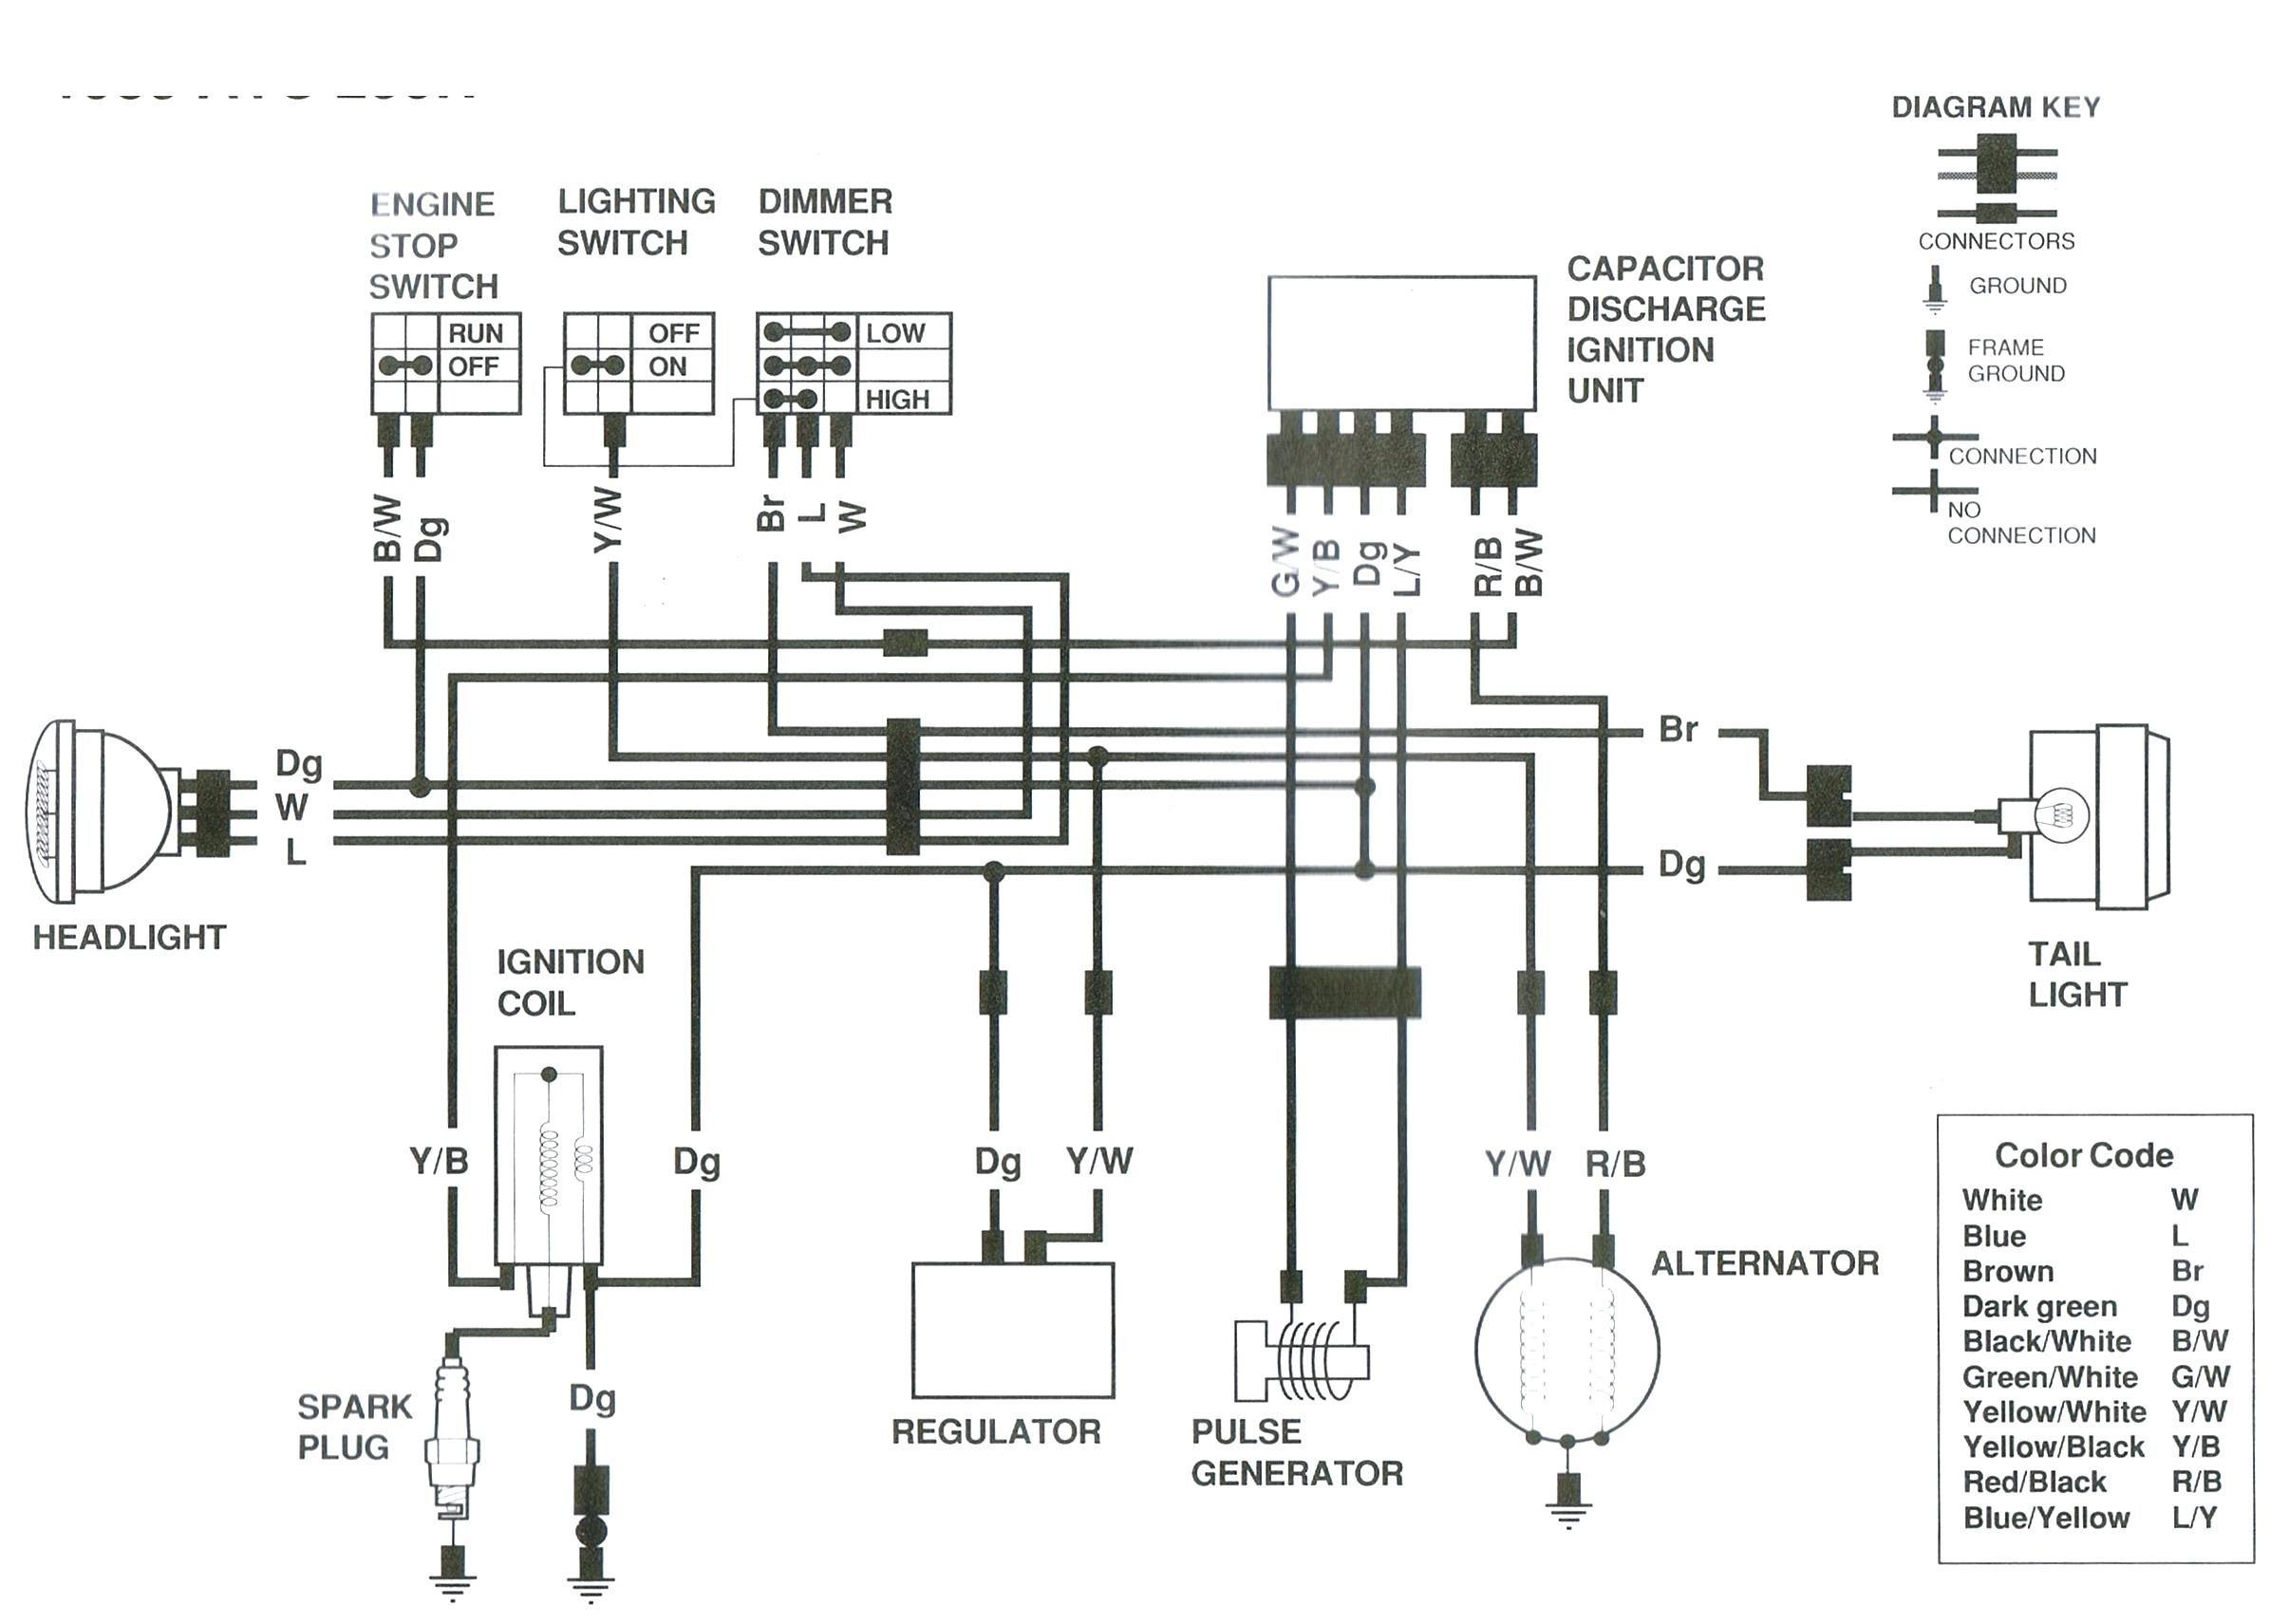 08 Honda Ruckus Wiring Diagram | Wiring Library - Honda Ruckus Wiring Diagram